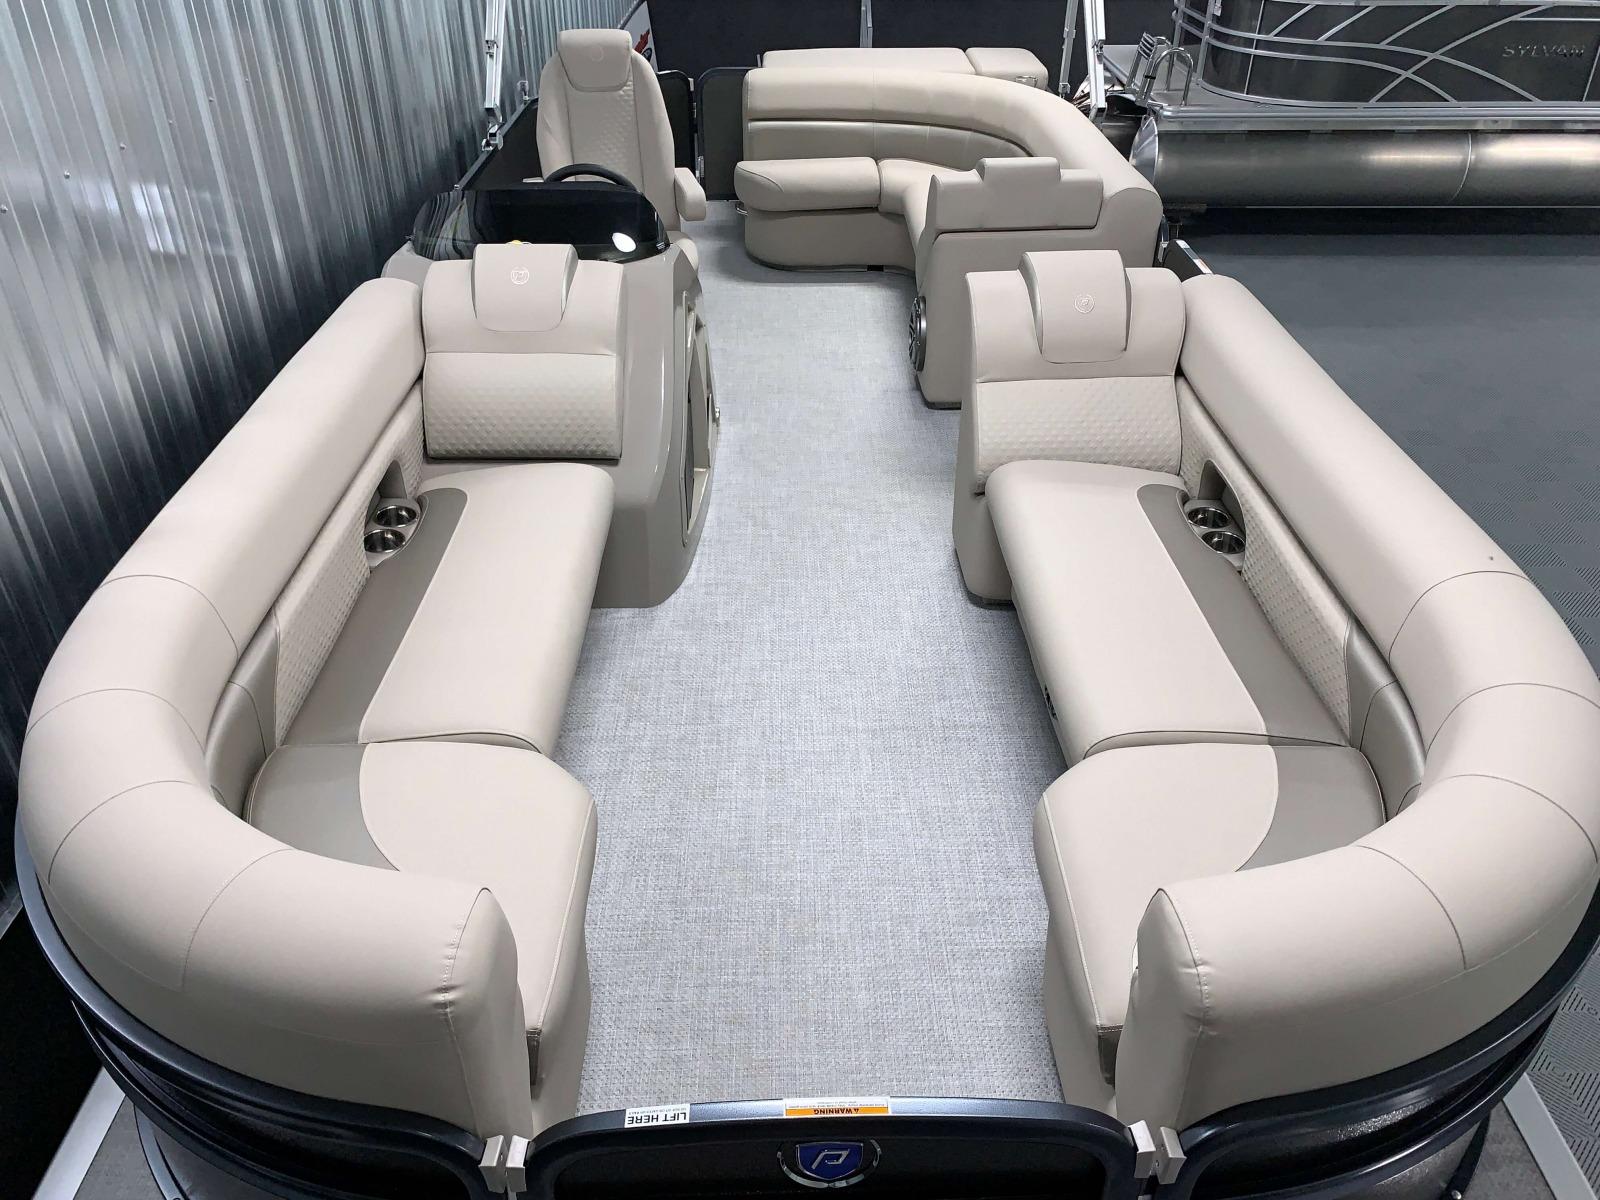 Paragon Vinyl Flooring of a 2020 Premier 220 Sunsation RE Pontoon Boat